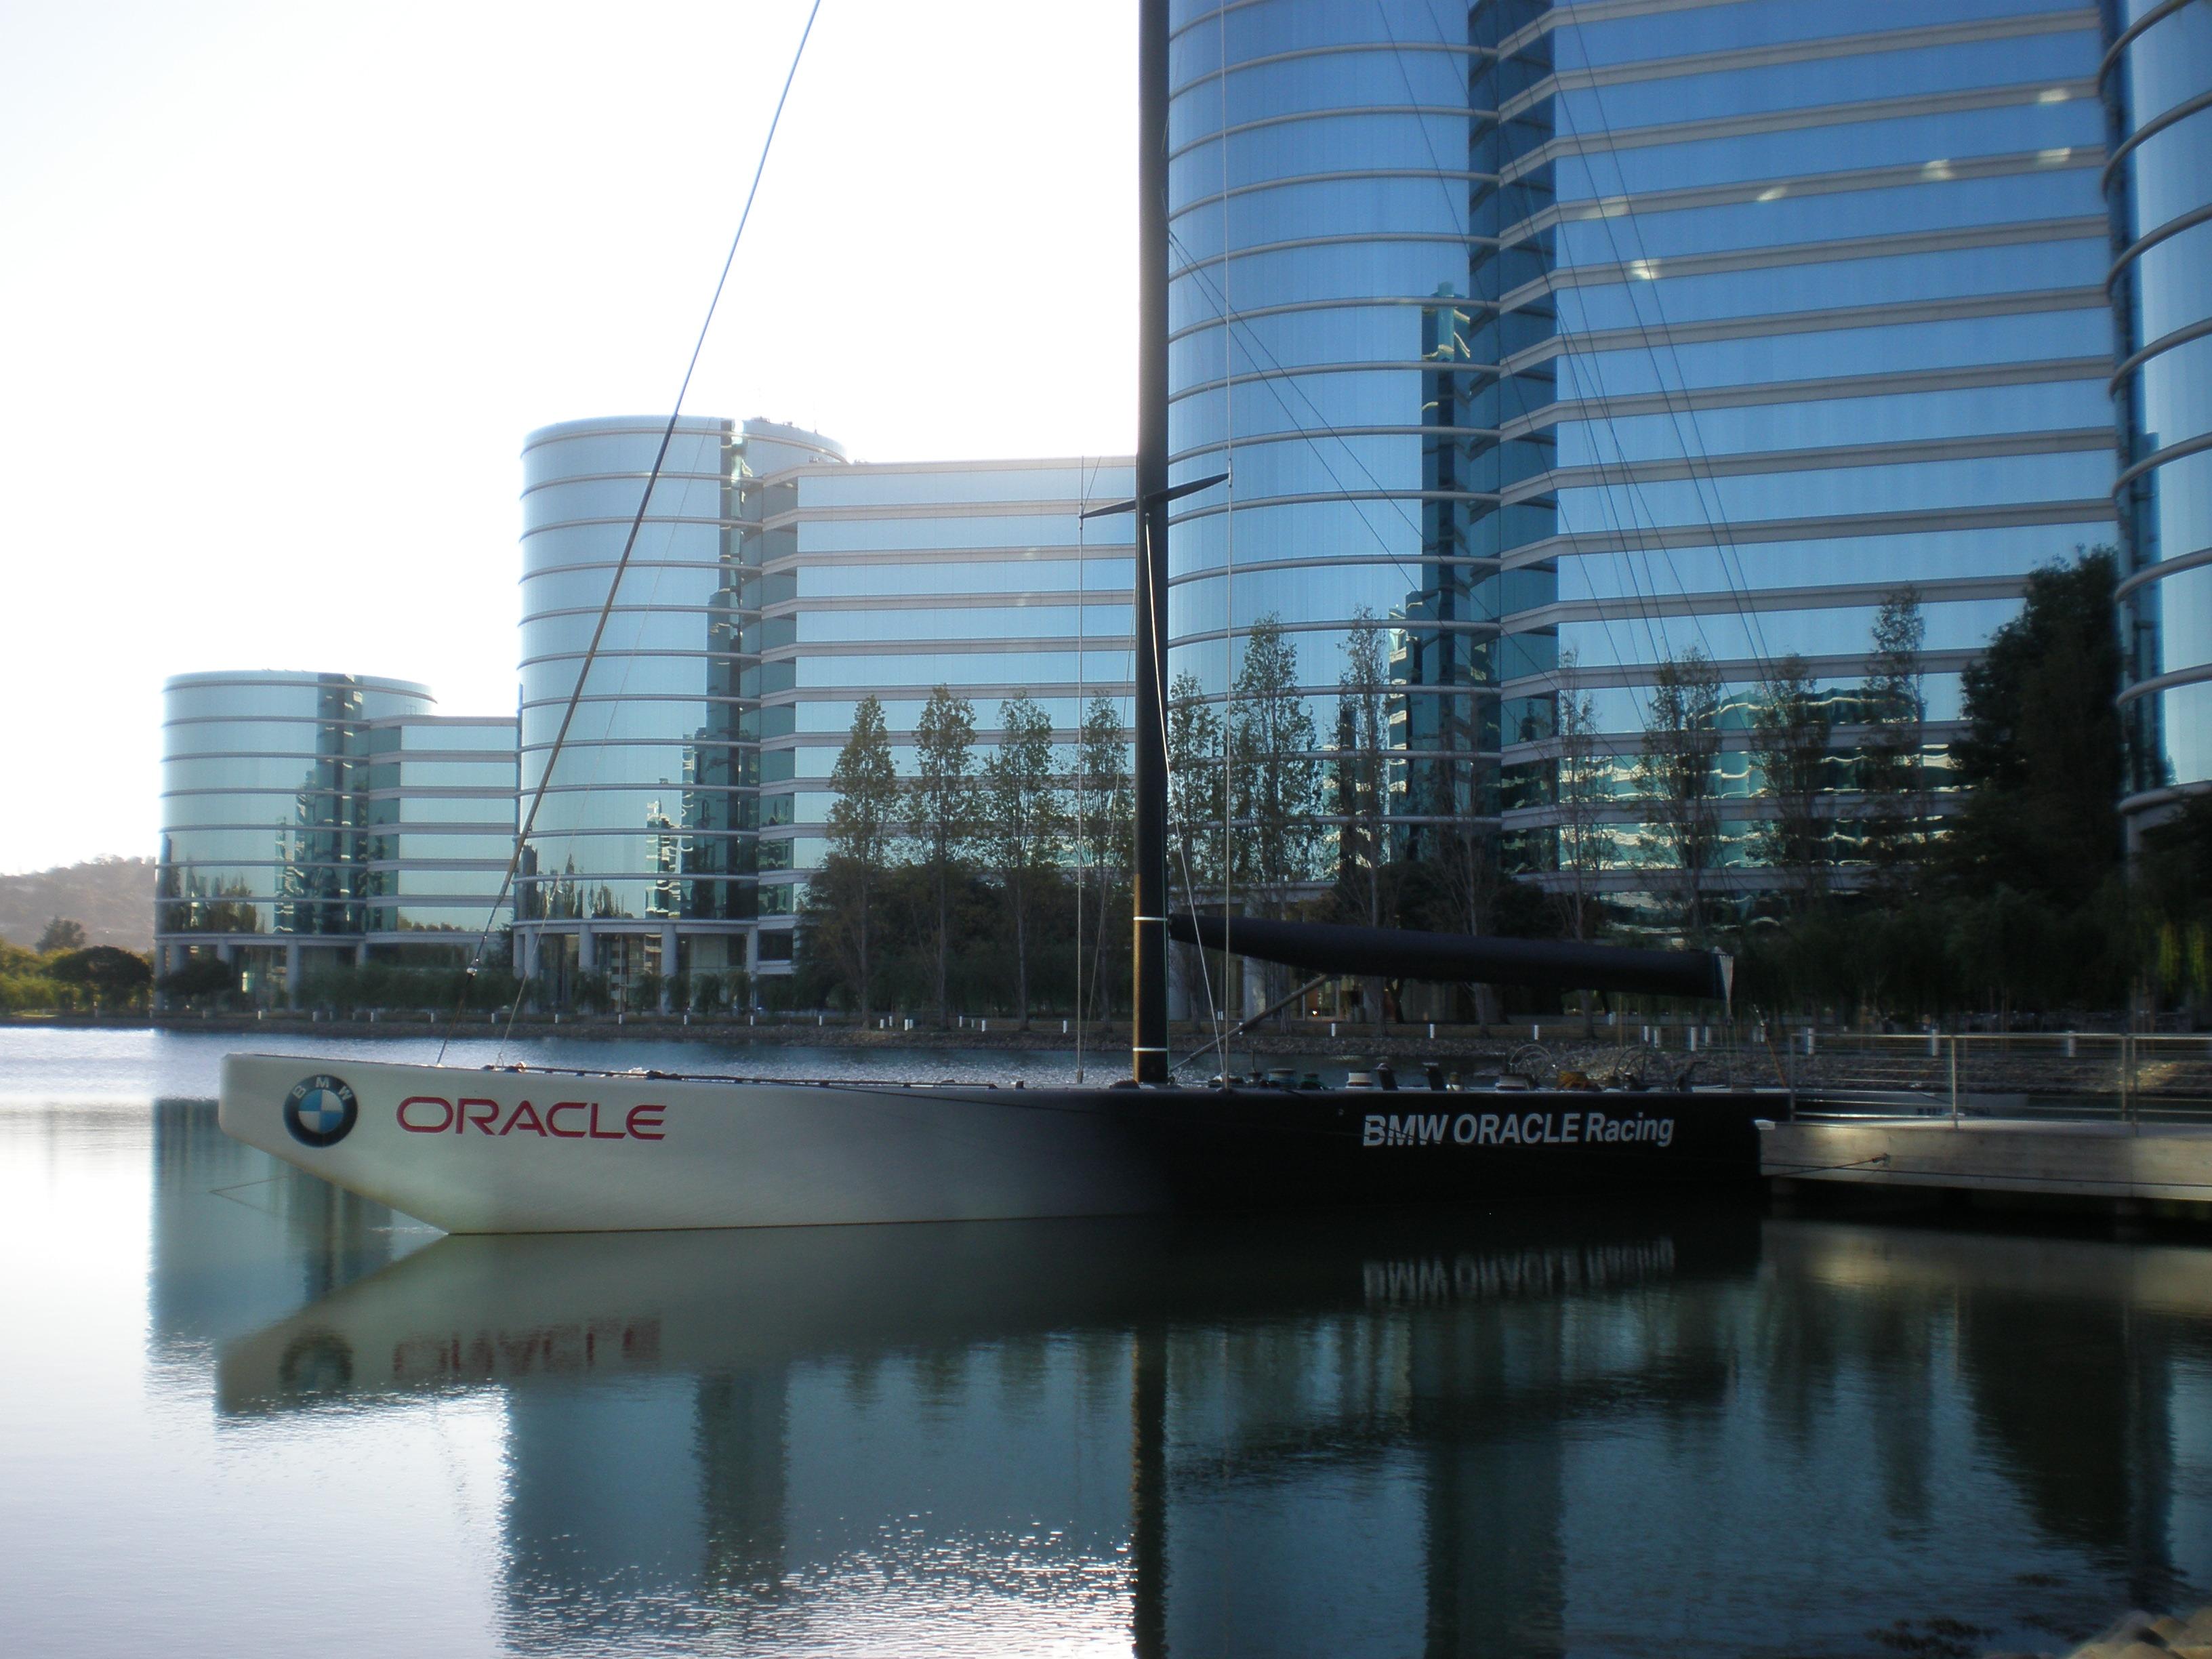 File:BMW ORACLE Racing USA 71 at Oracle HQ 2 JPG - Wikimedia